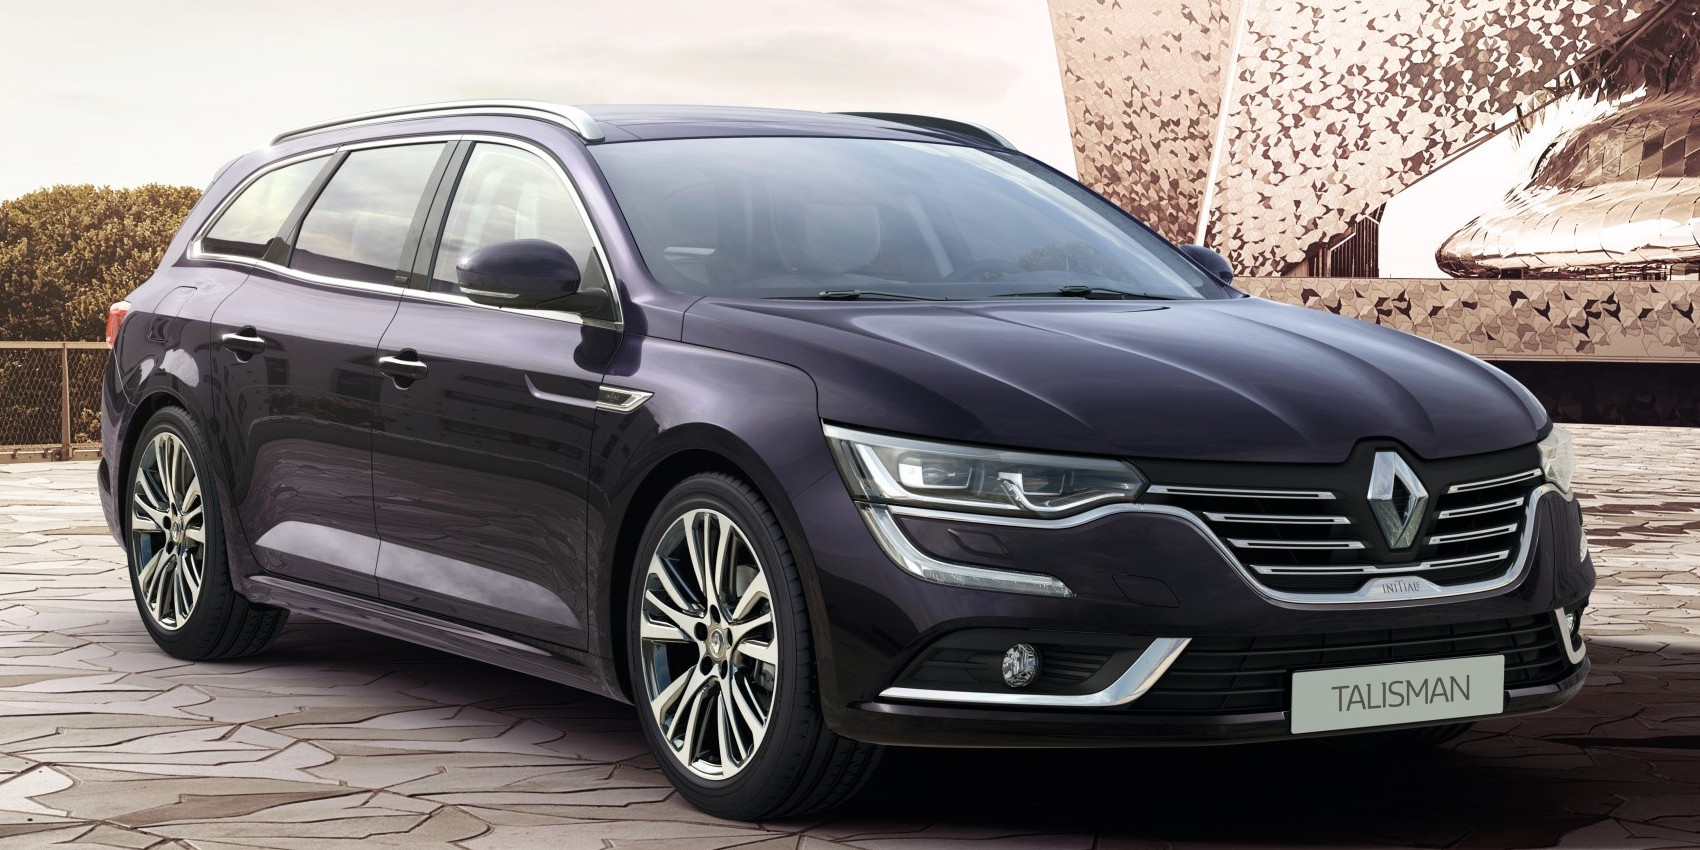 Renault Talisman sporter station wagon 2